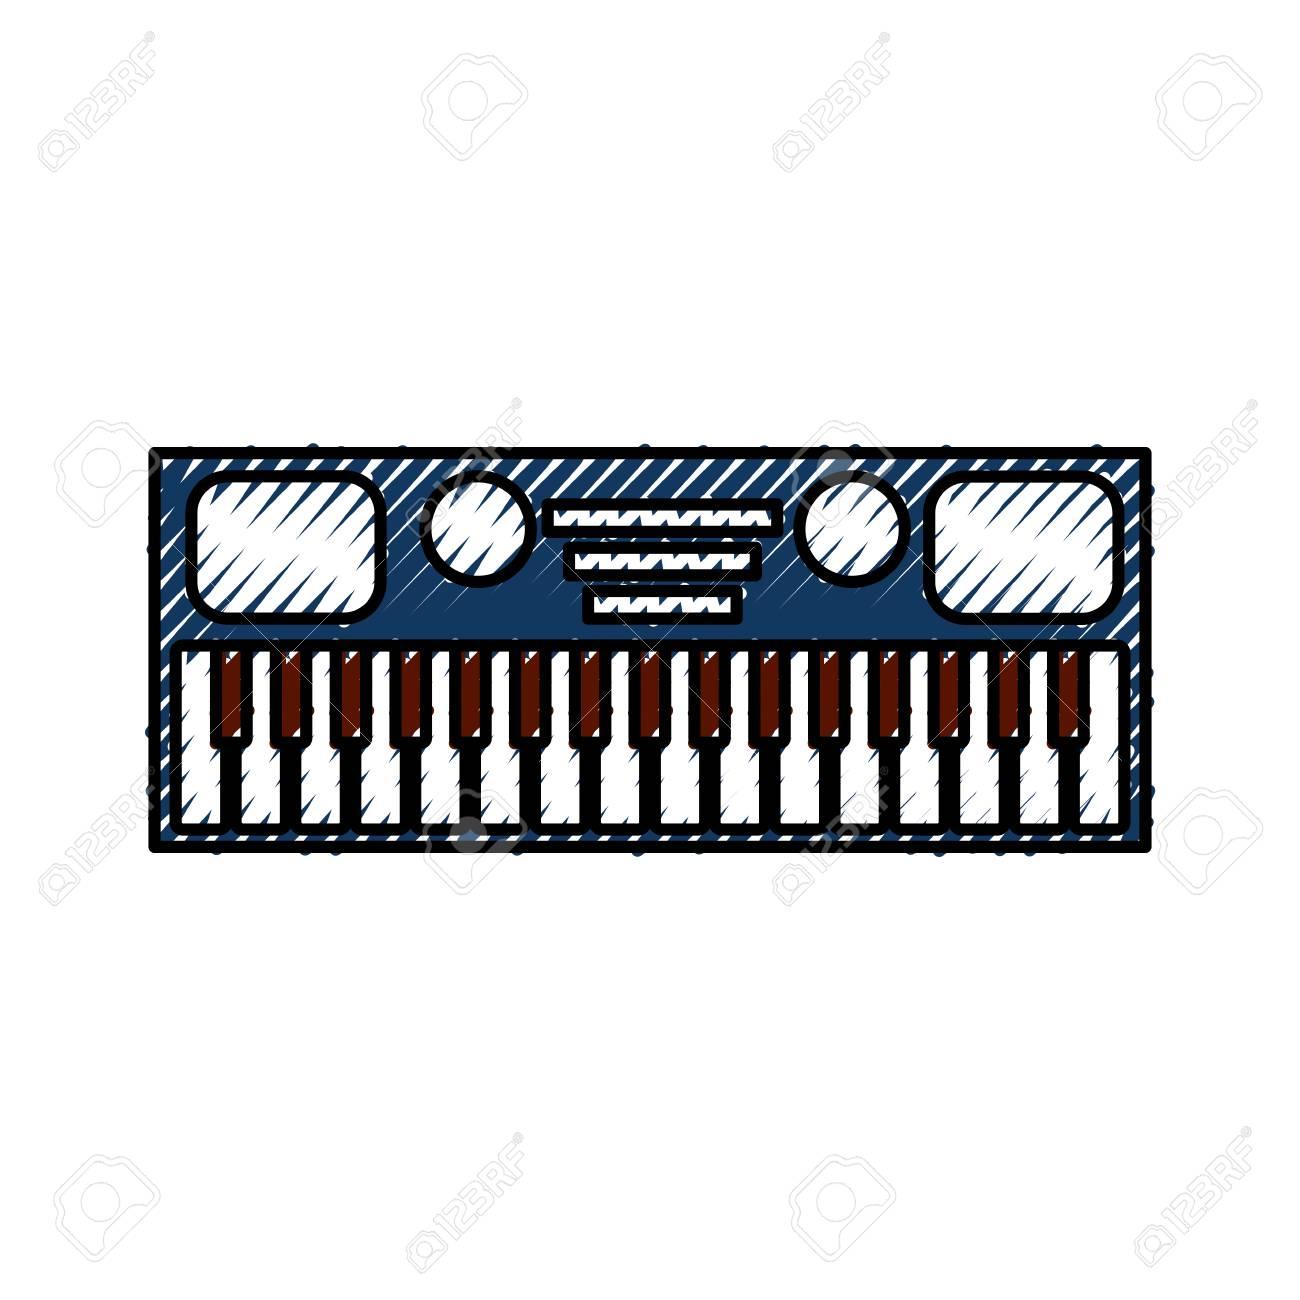 synthesizer electronic instrument keyboard musical on white background vector illustration - 88431403